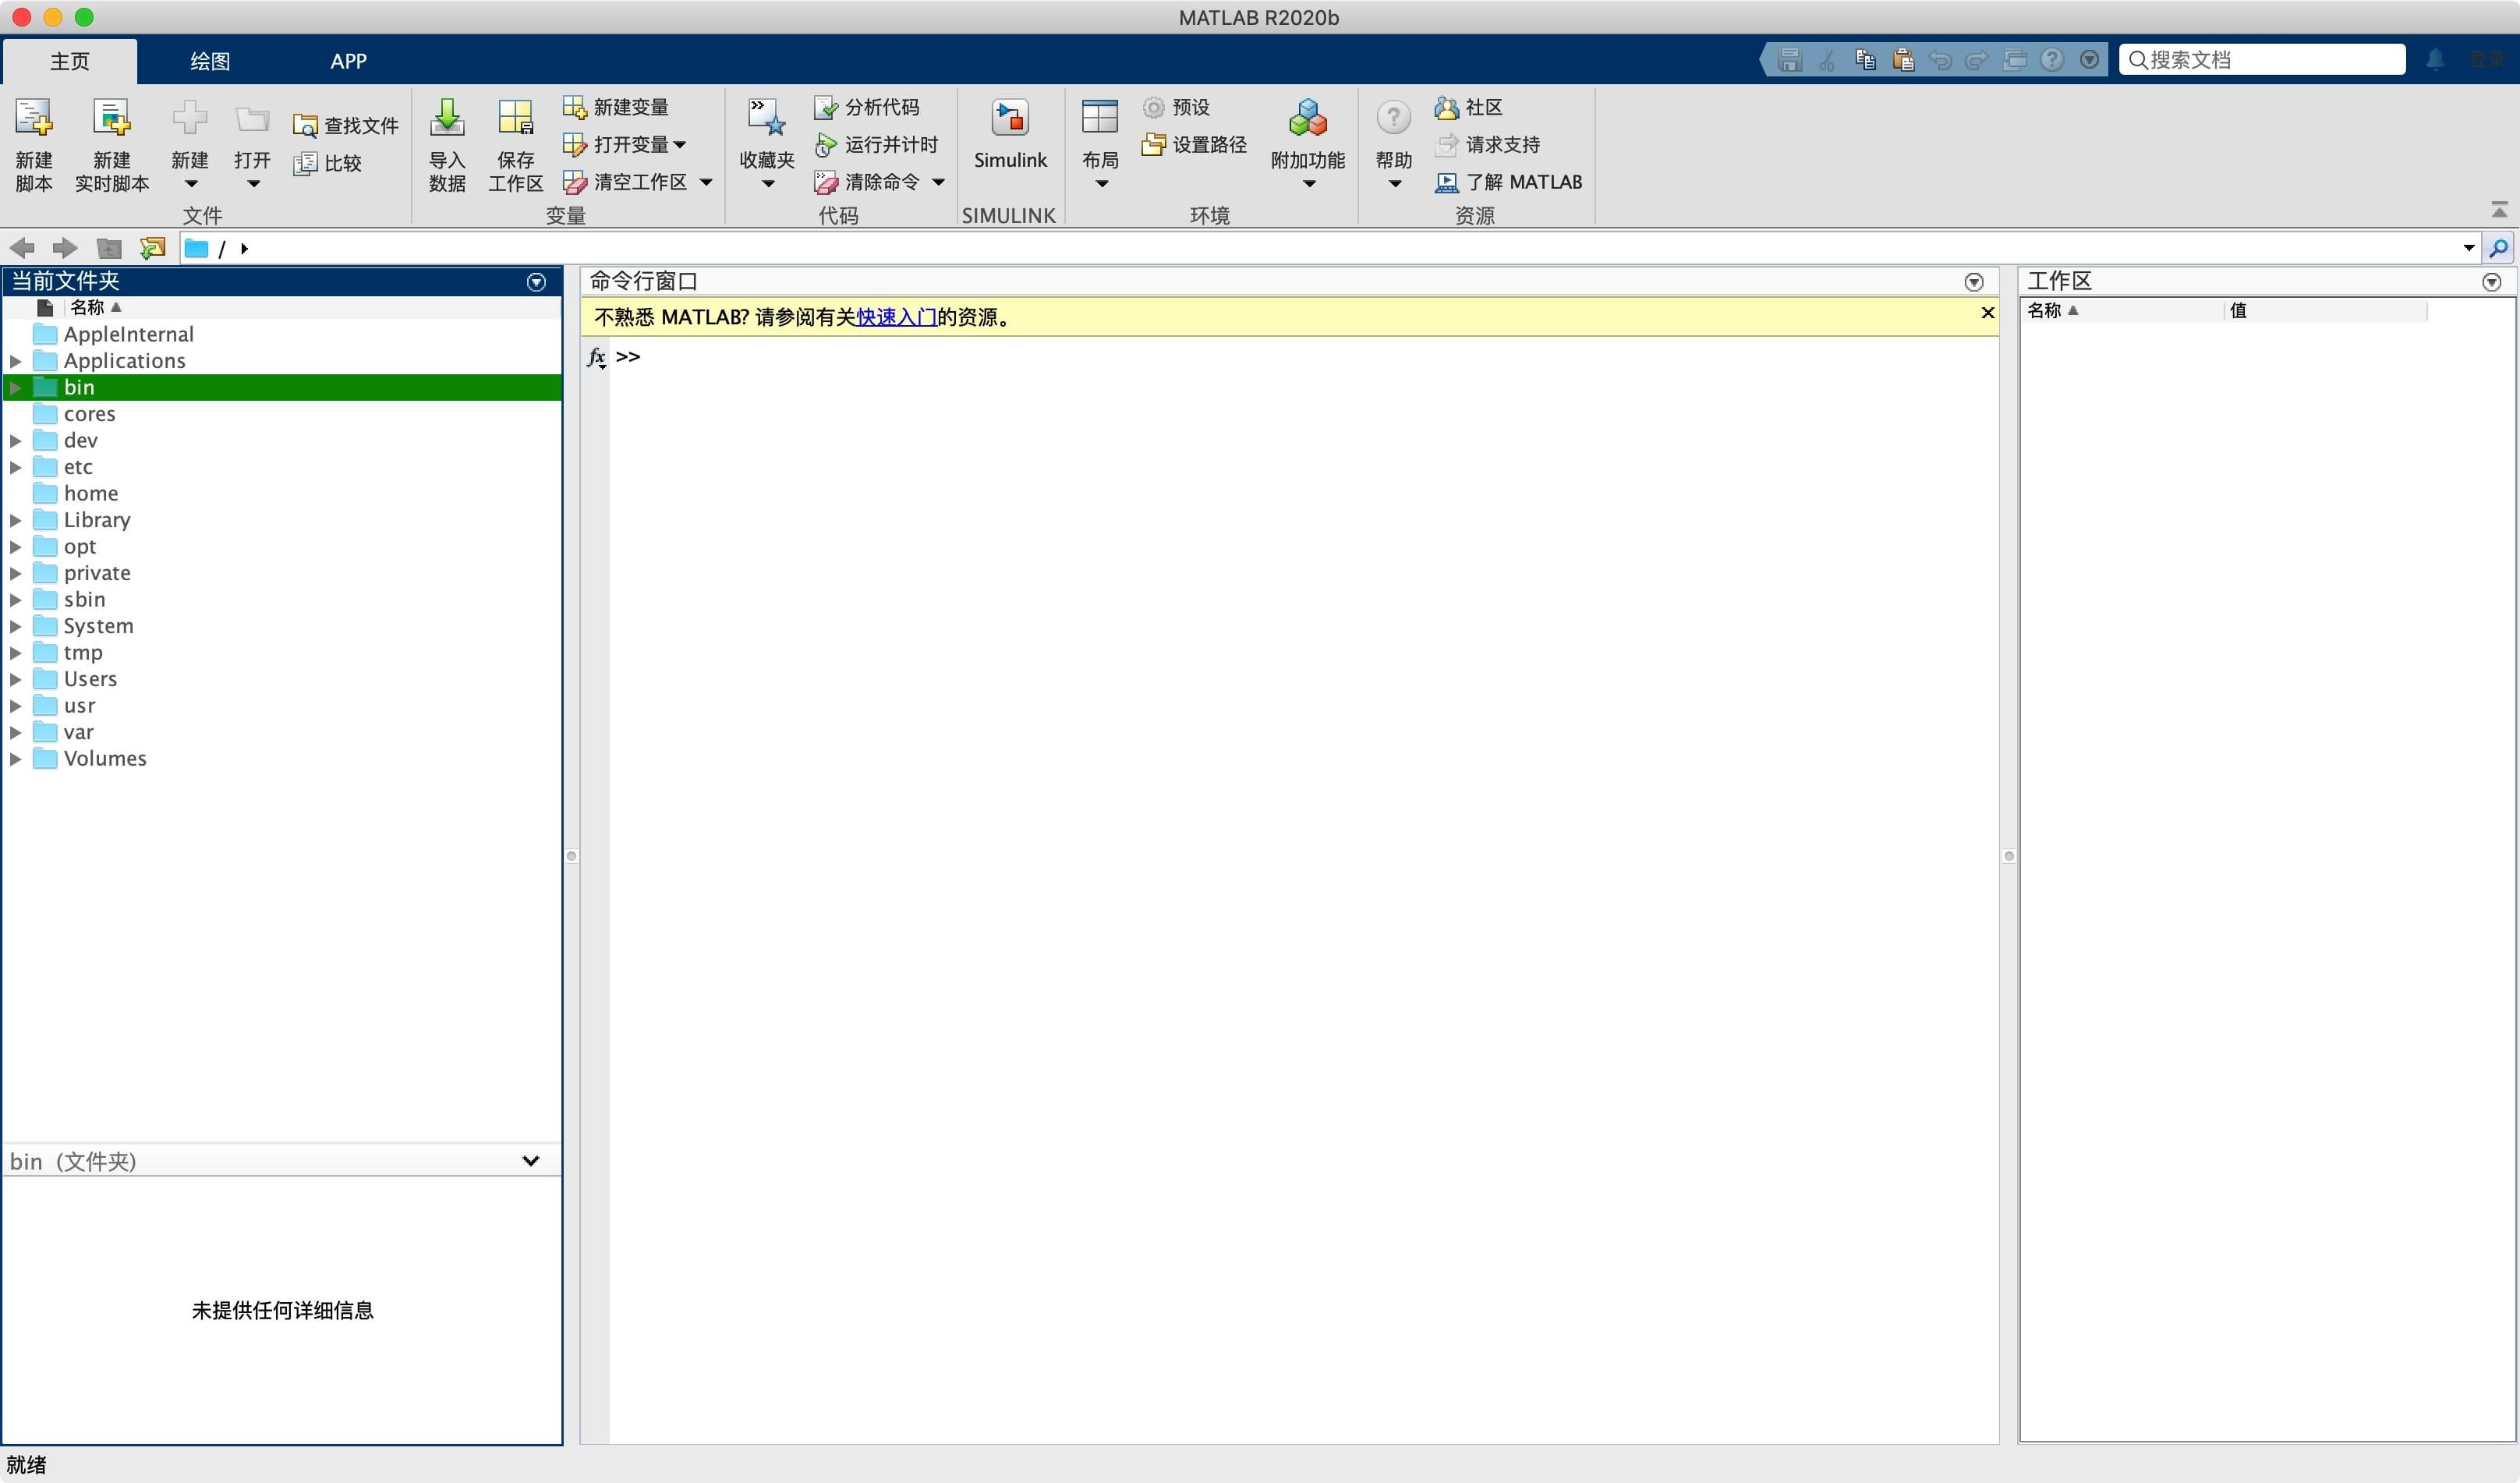 Mathworks MATLAB R2020b for Mac 强大的商业数学软件 行业软件 第3张